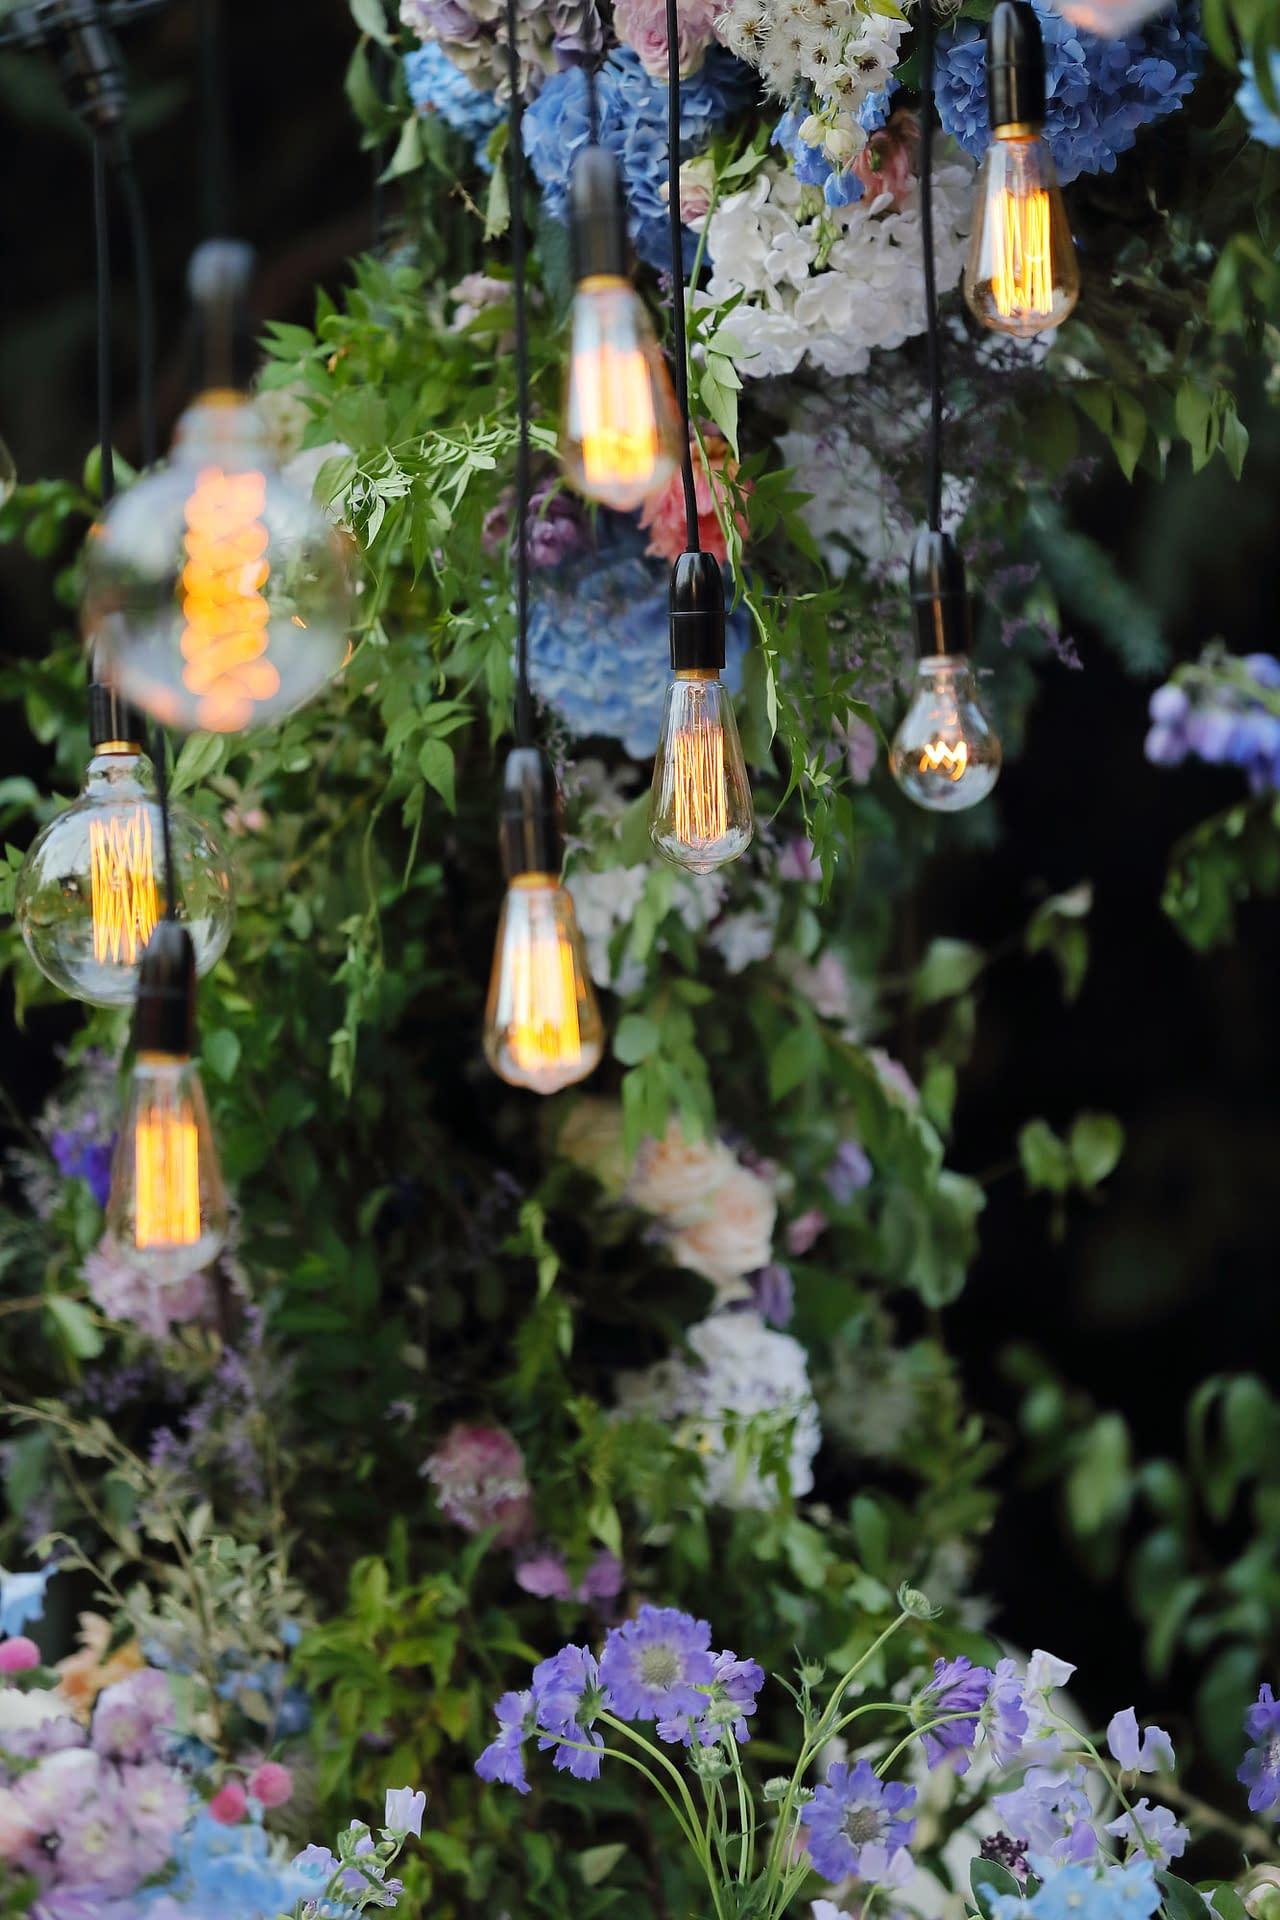 beautiful midsummer nights dream themed wedding photoshoot in a secret garden location